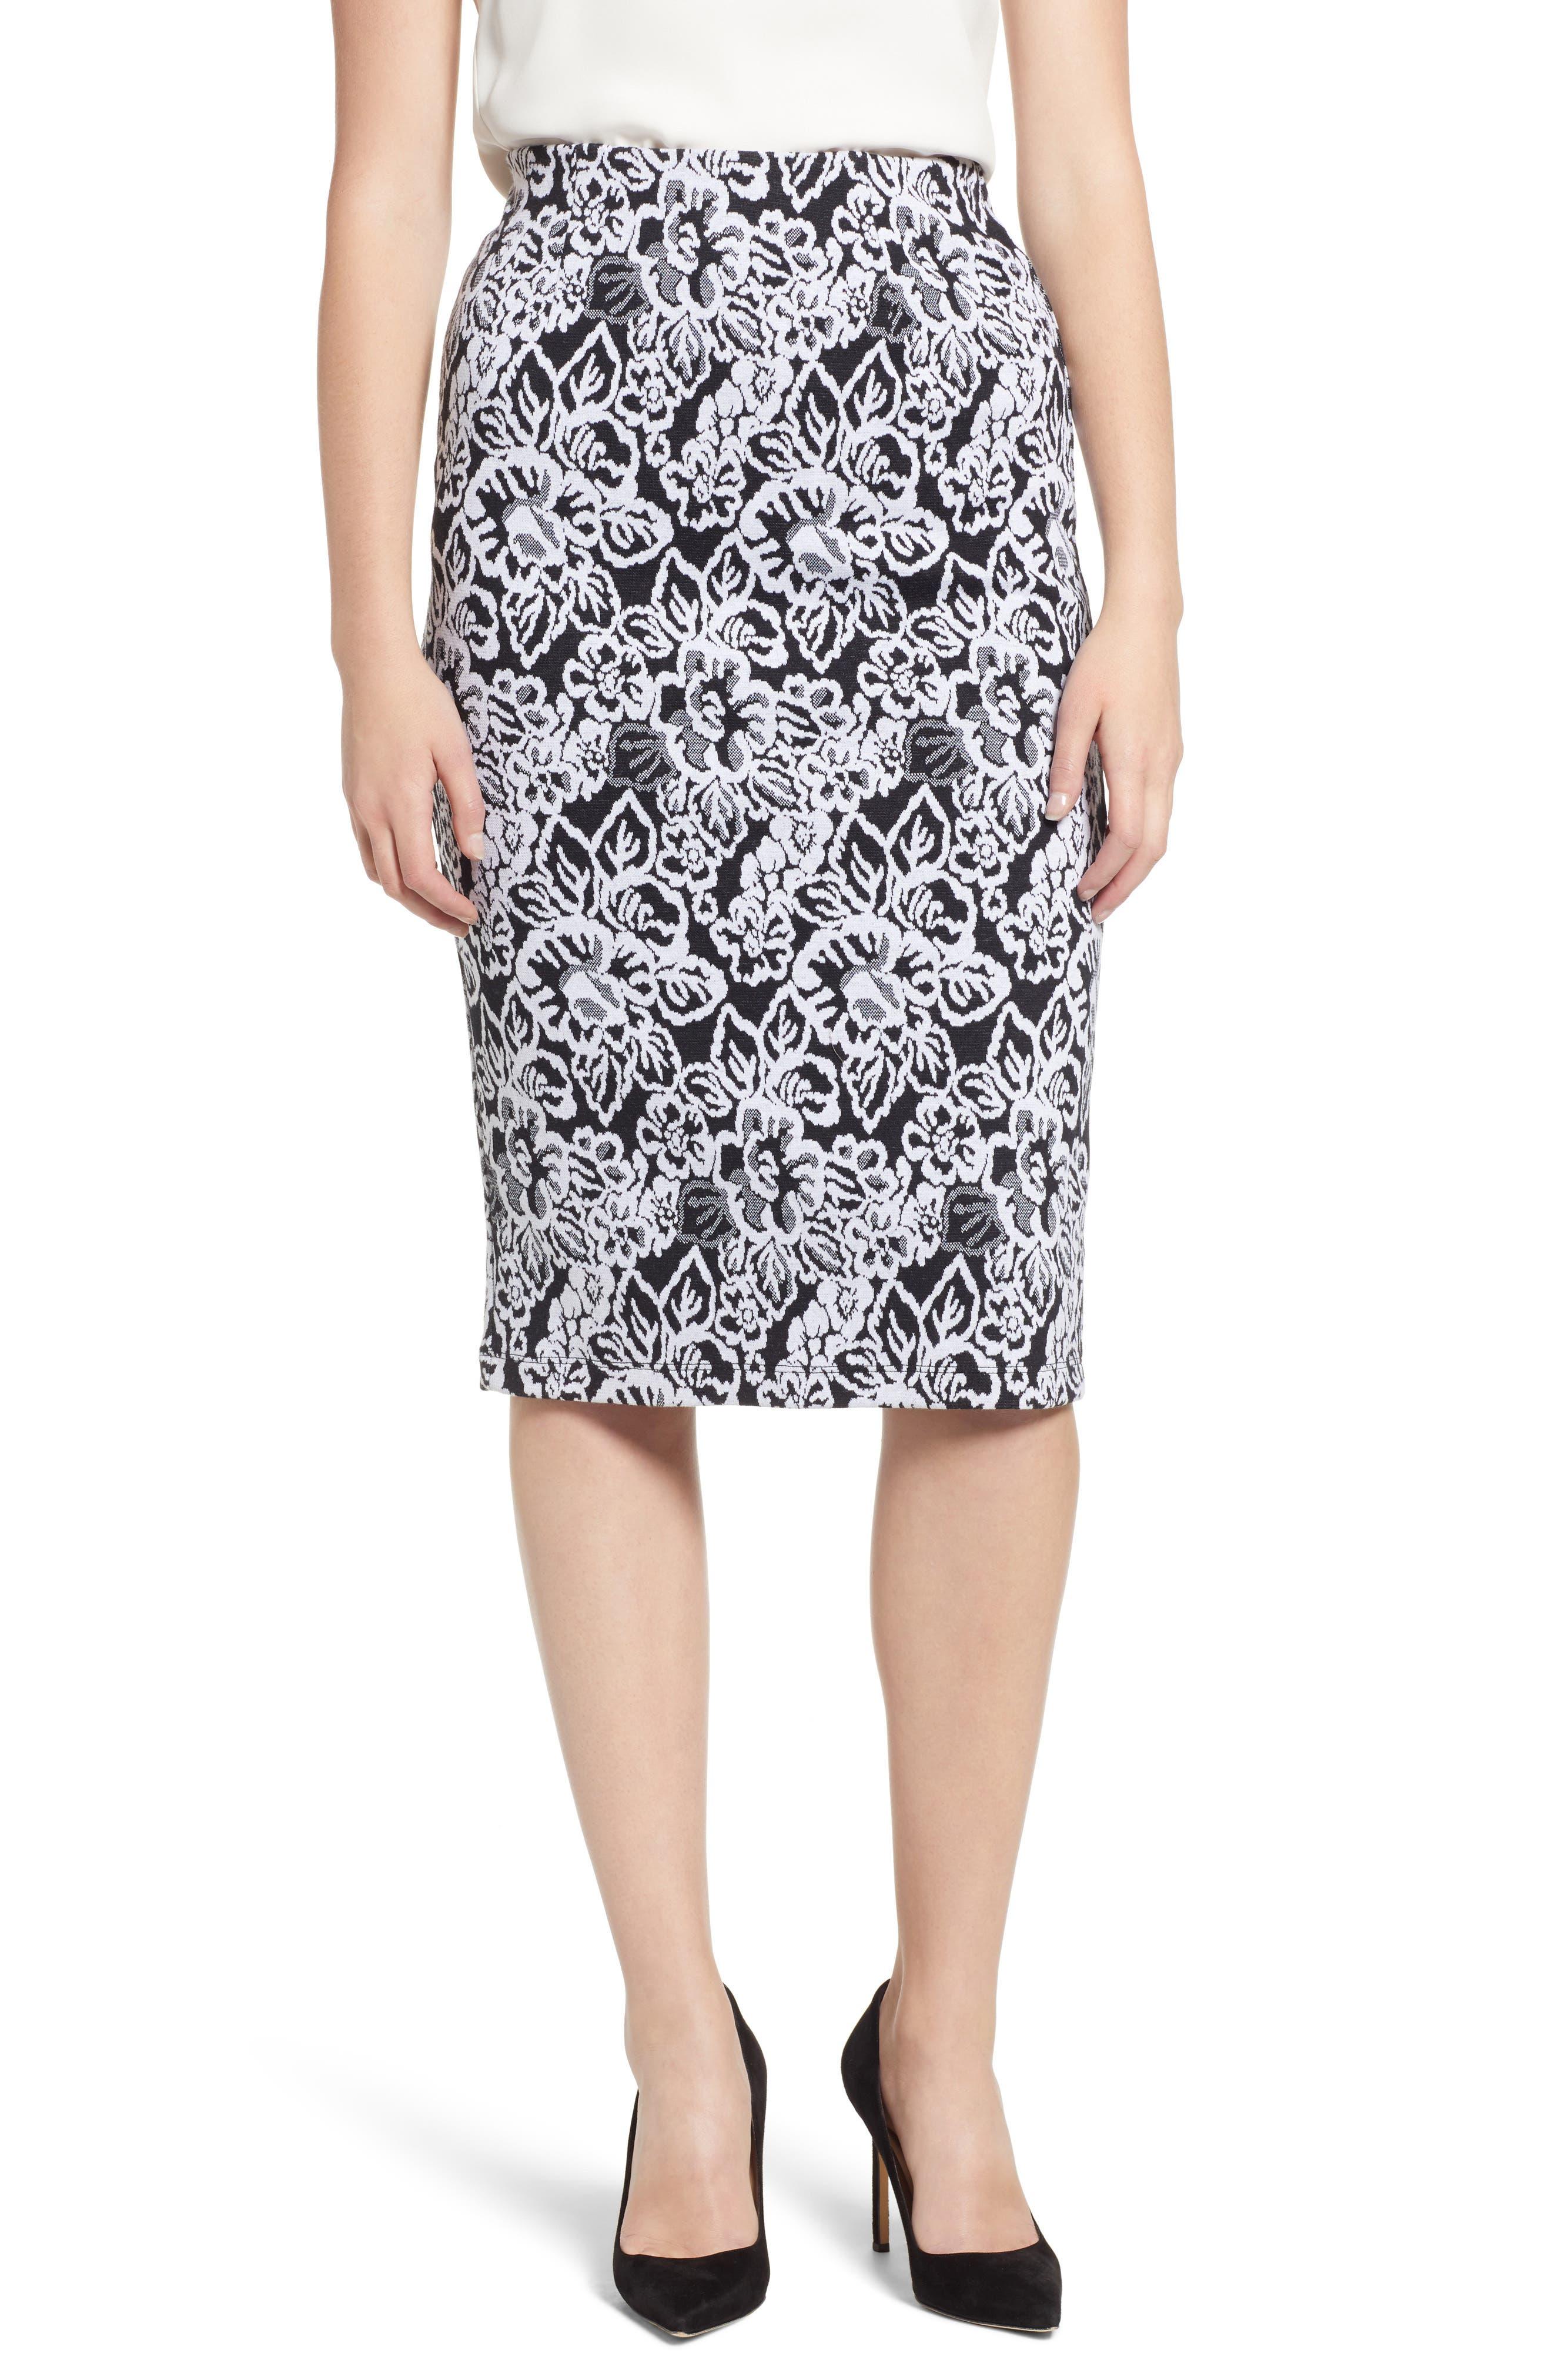 Everleigh Double Knit Pencil Skirt, Black